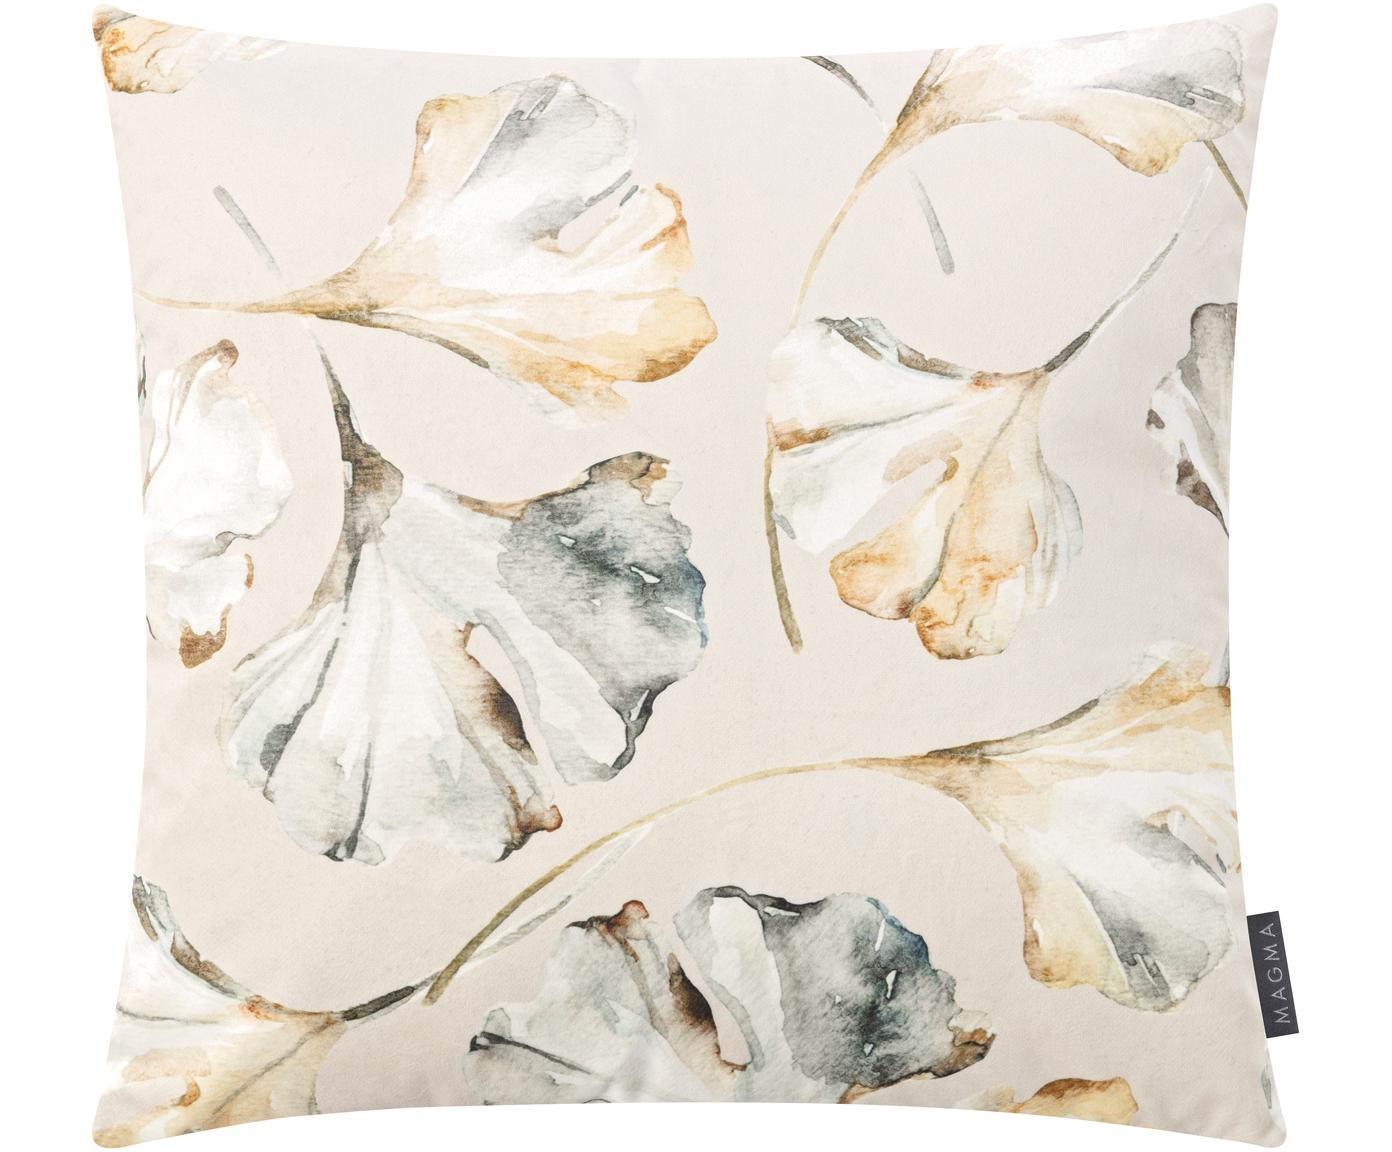 Funda de cojín de terciopleo Flores, caras distintas, 100%terciopelo de poliéster, Beige, multicolor, An 50 x L 50 cm